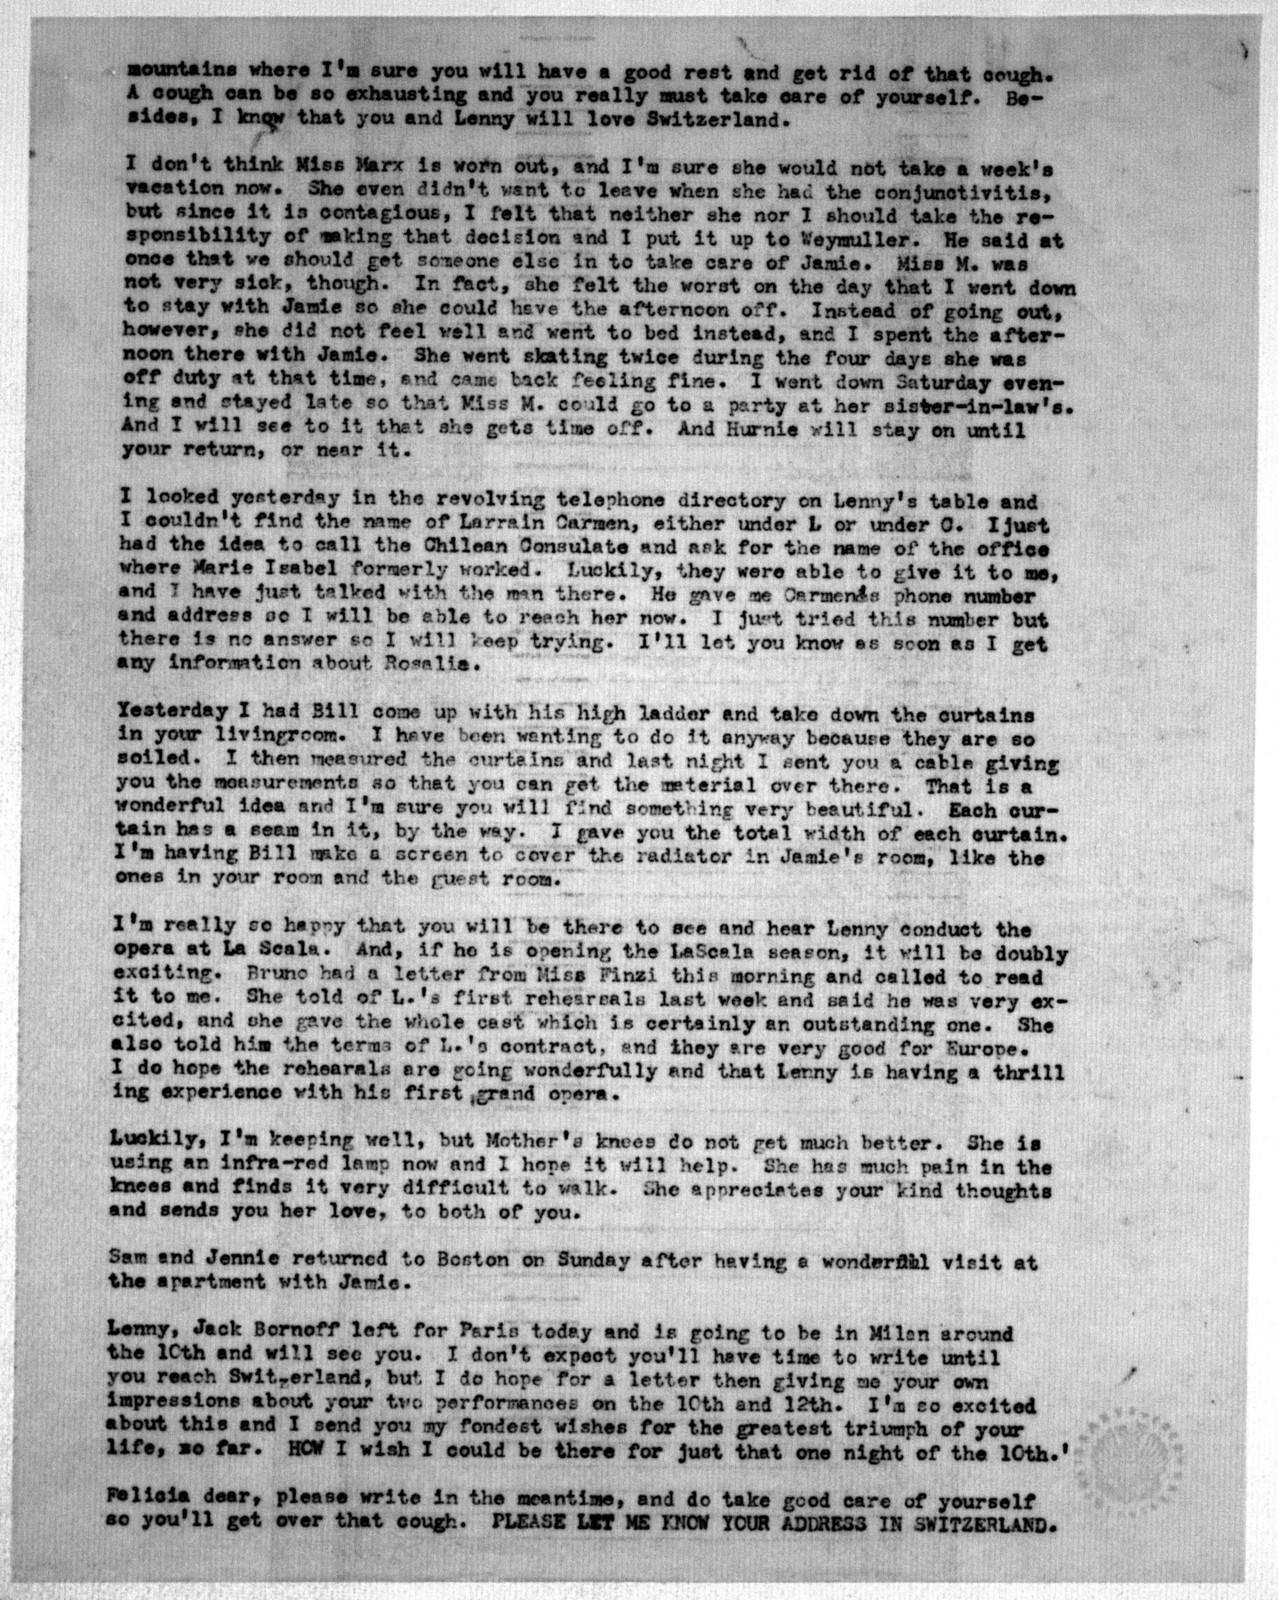 Letter from Helen Coates to Felicia Bernstein, December 1, 1953